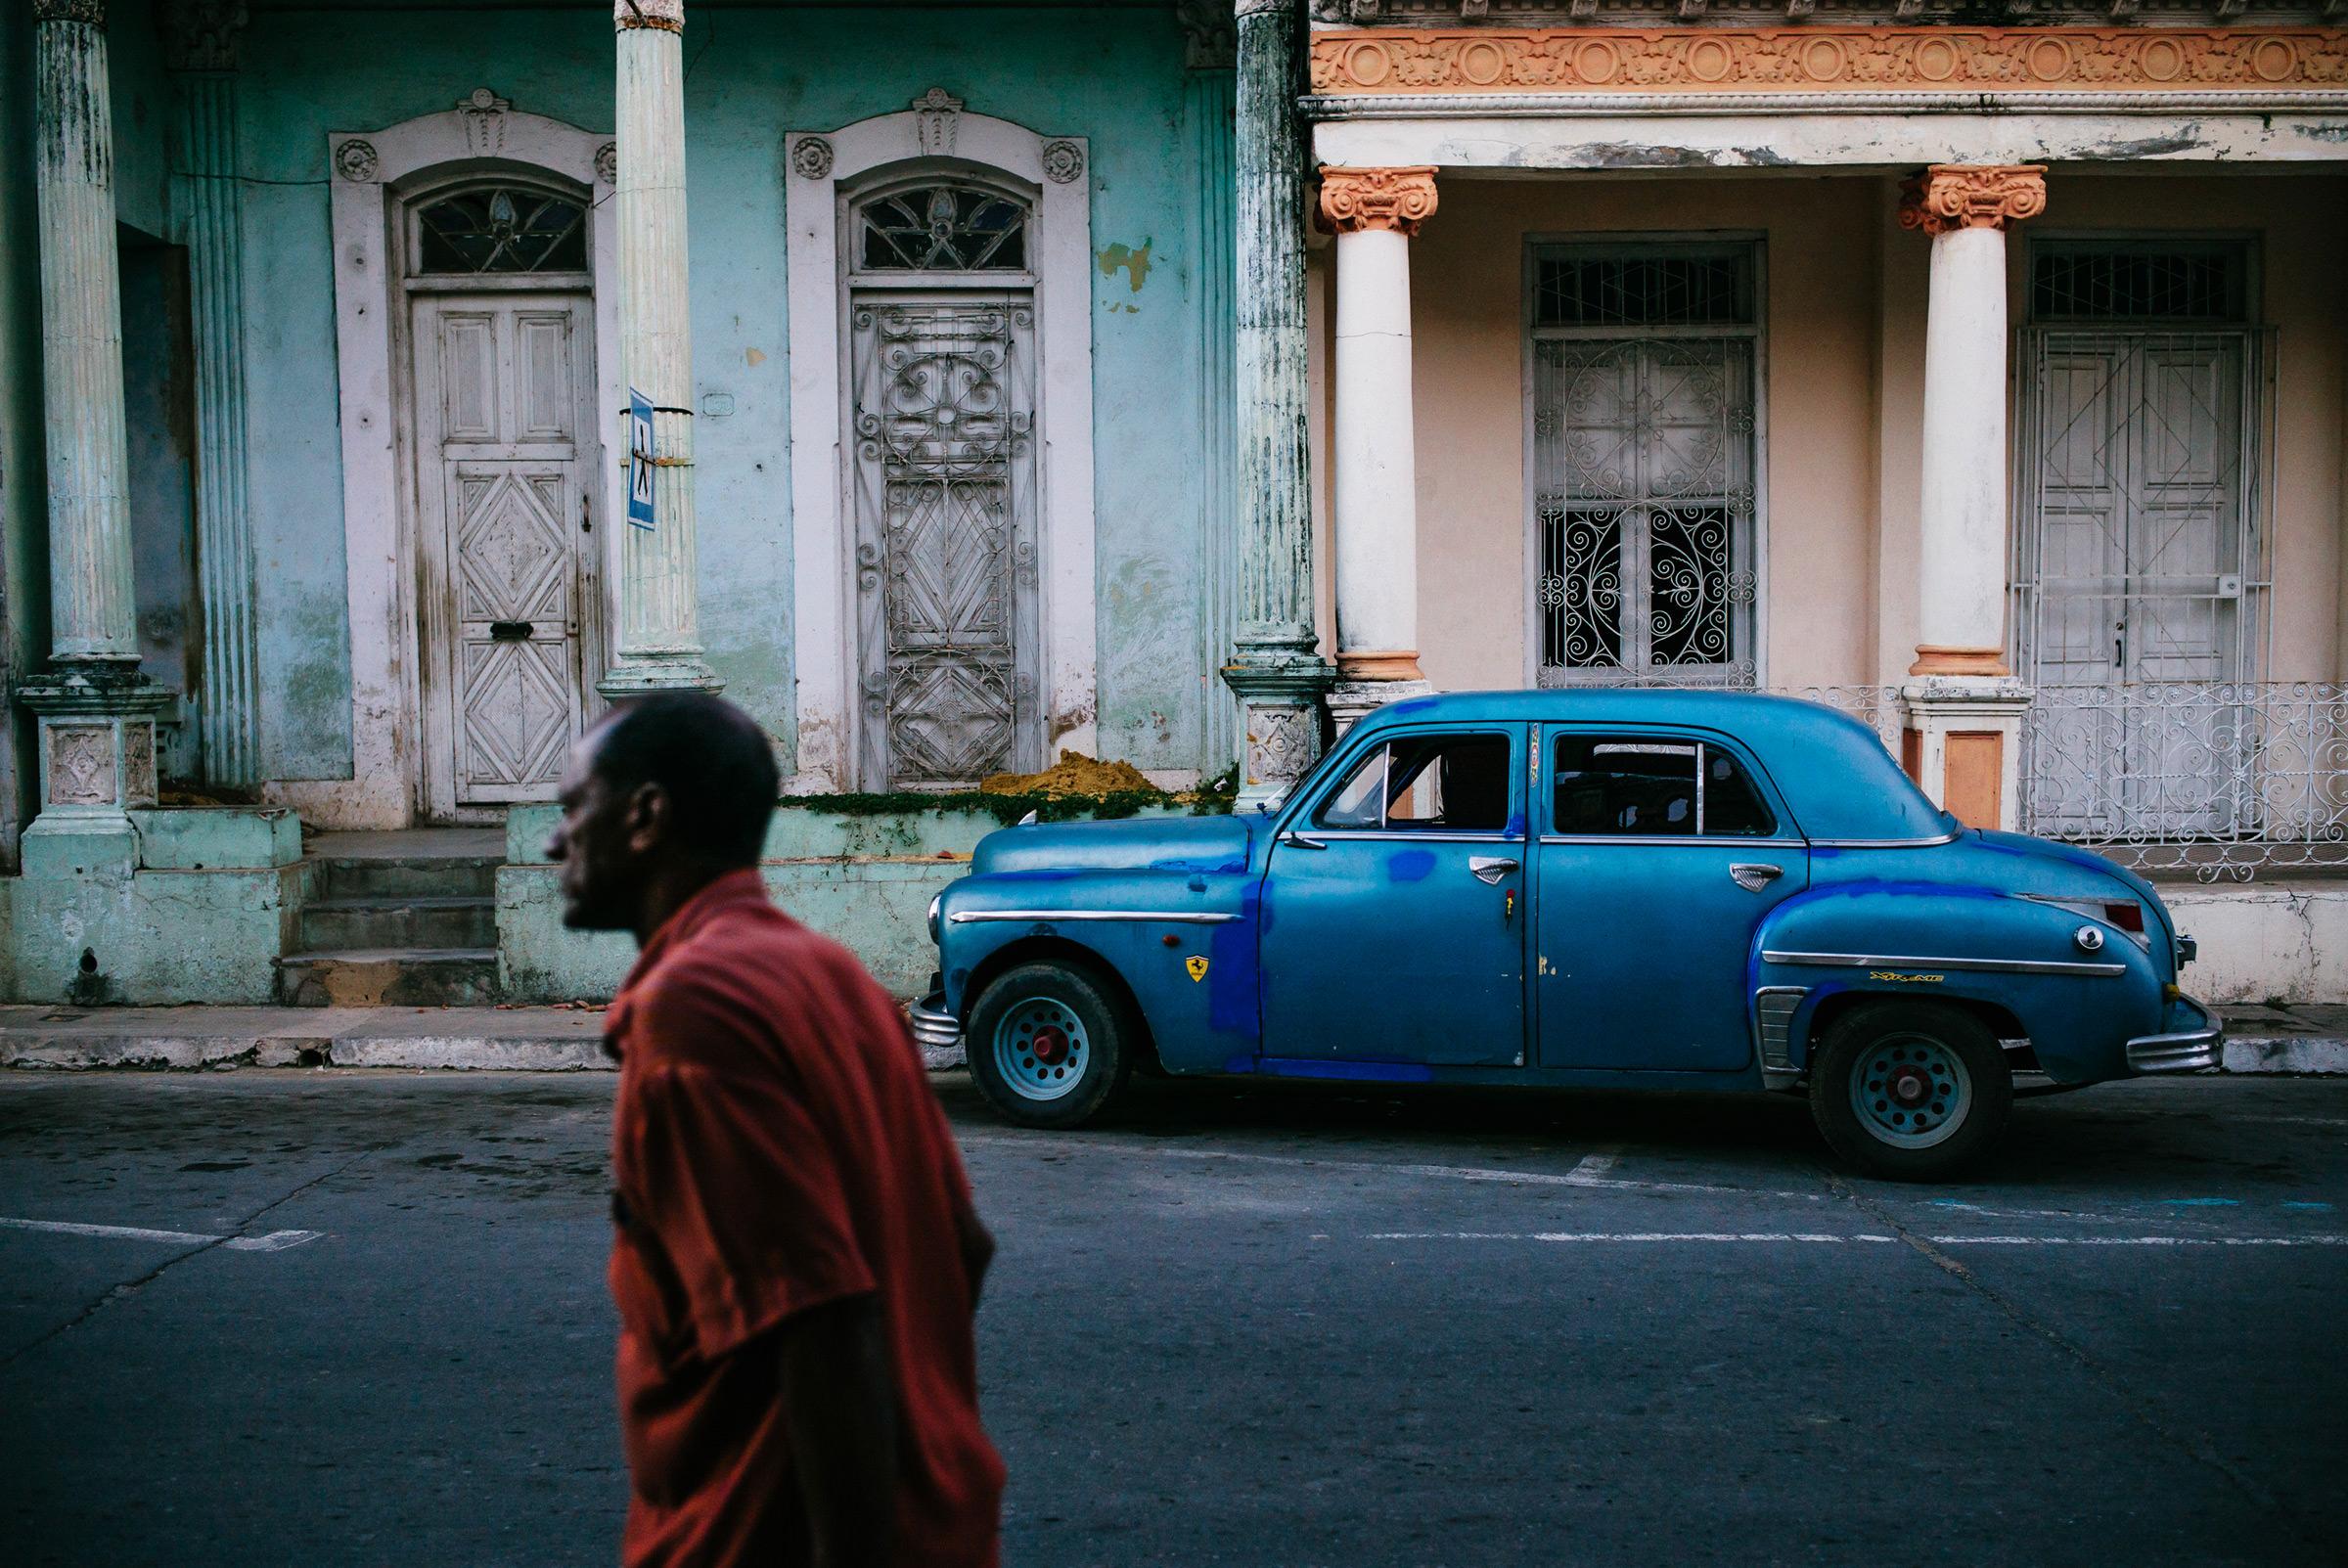 brandon_patoc_travel_cuba_worldwide_photographer0019.jpg